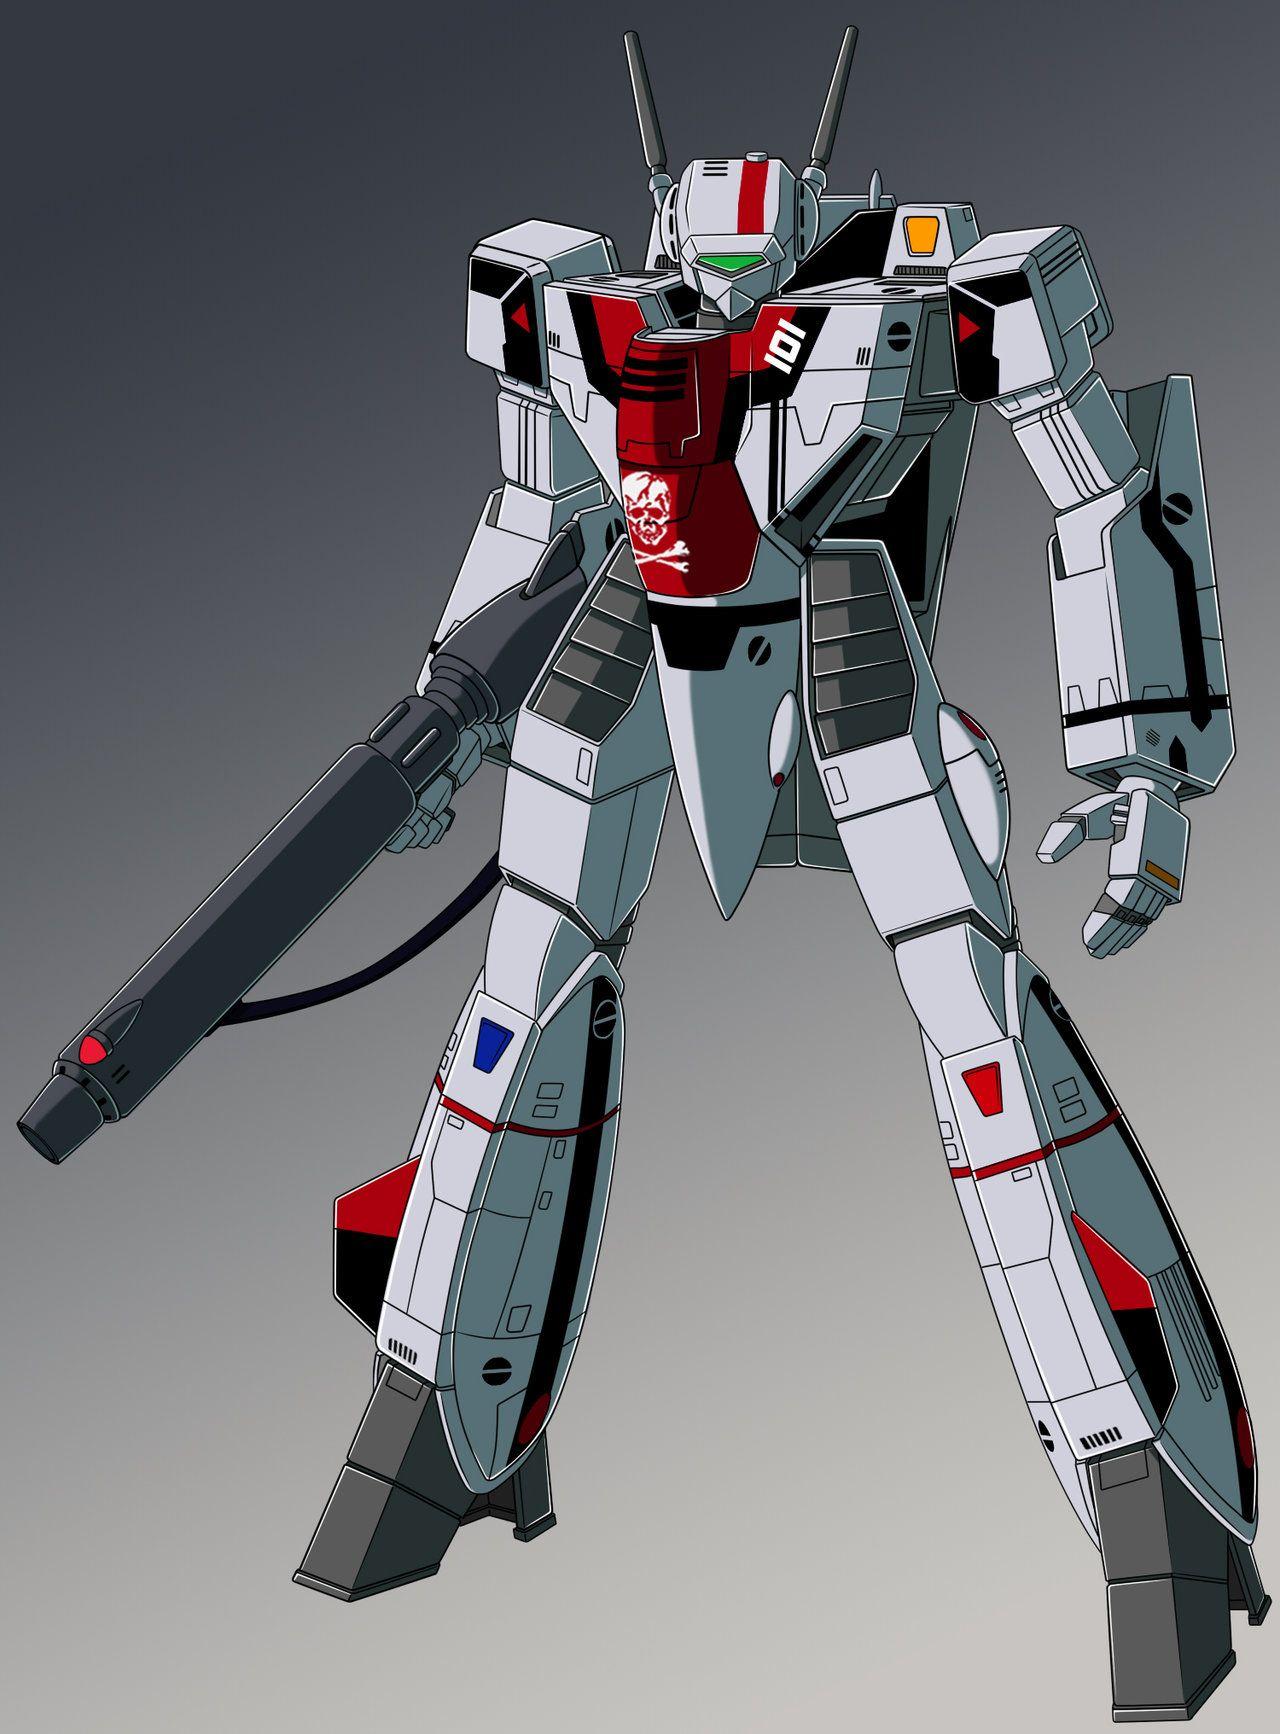 hikaru s vf 1j from macross the first 超時空要塞マクロス 要塞 装甲騎兵 ボトムズ